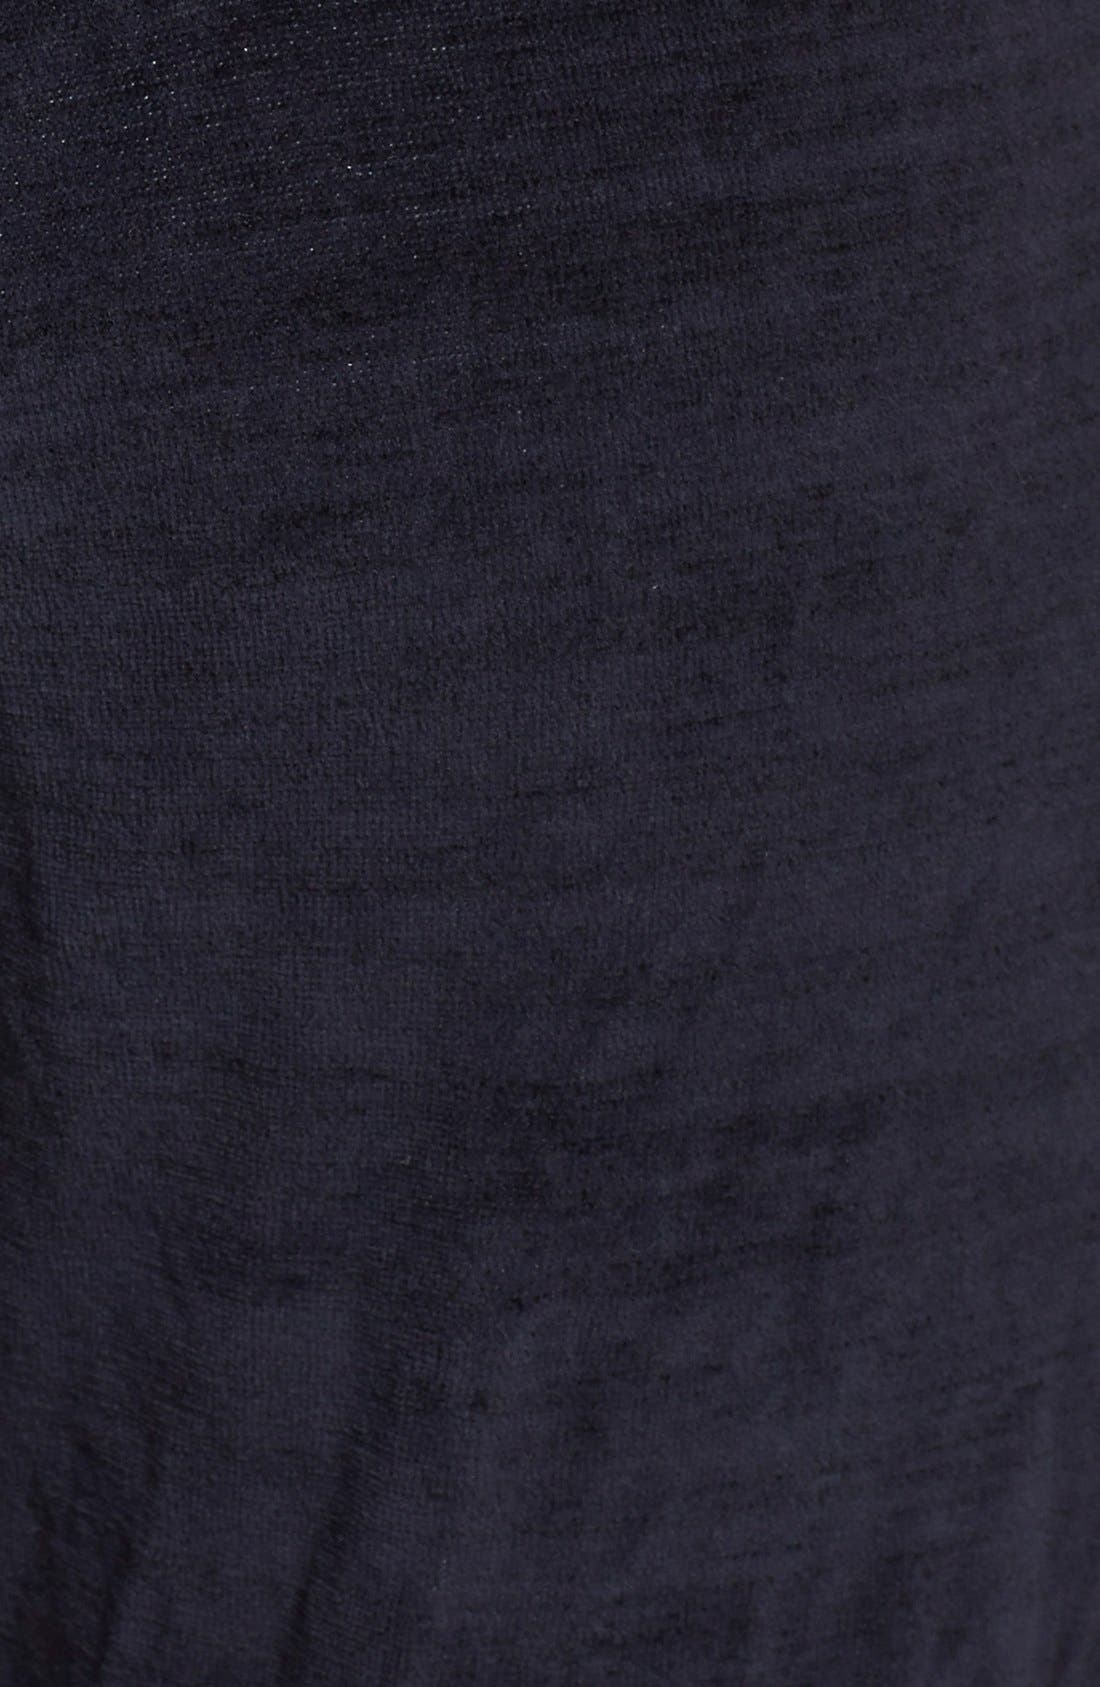 Alternate Image 4  - Monrow 'Cosmic' Vintage Velour Sweatpants